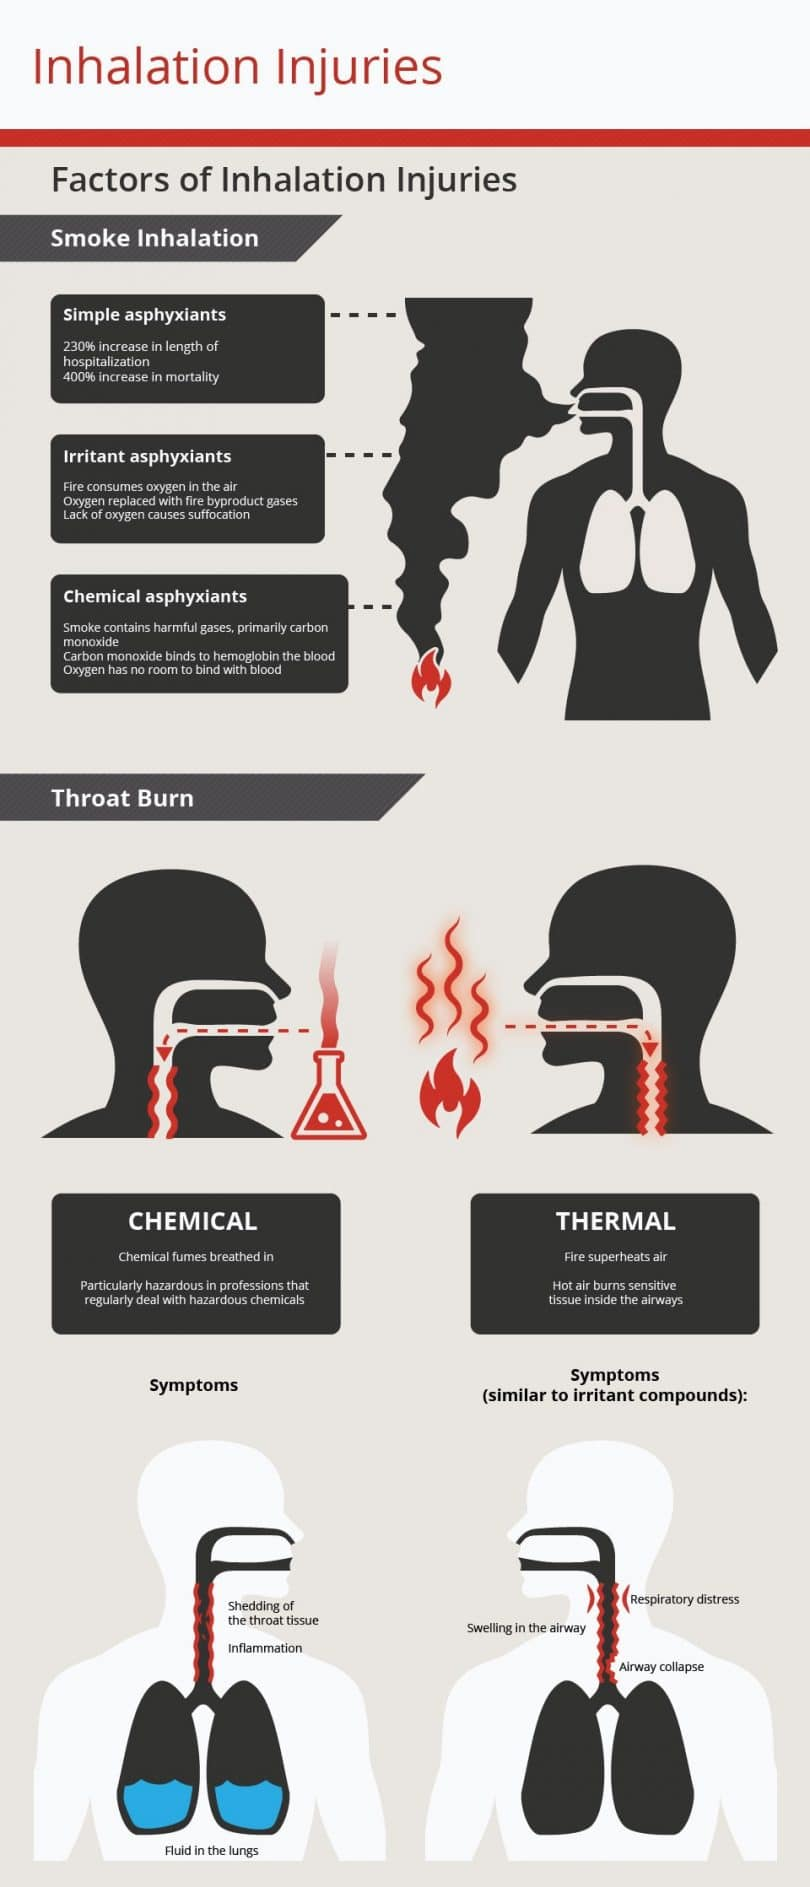 Inhalation injuries